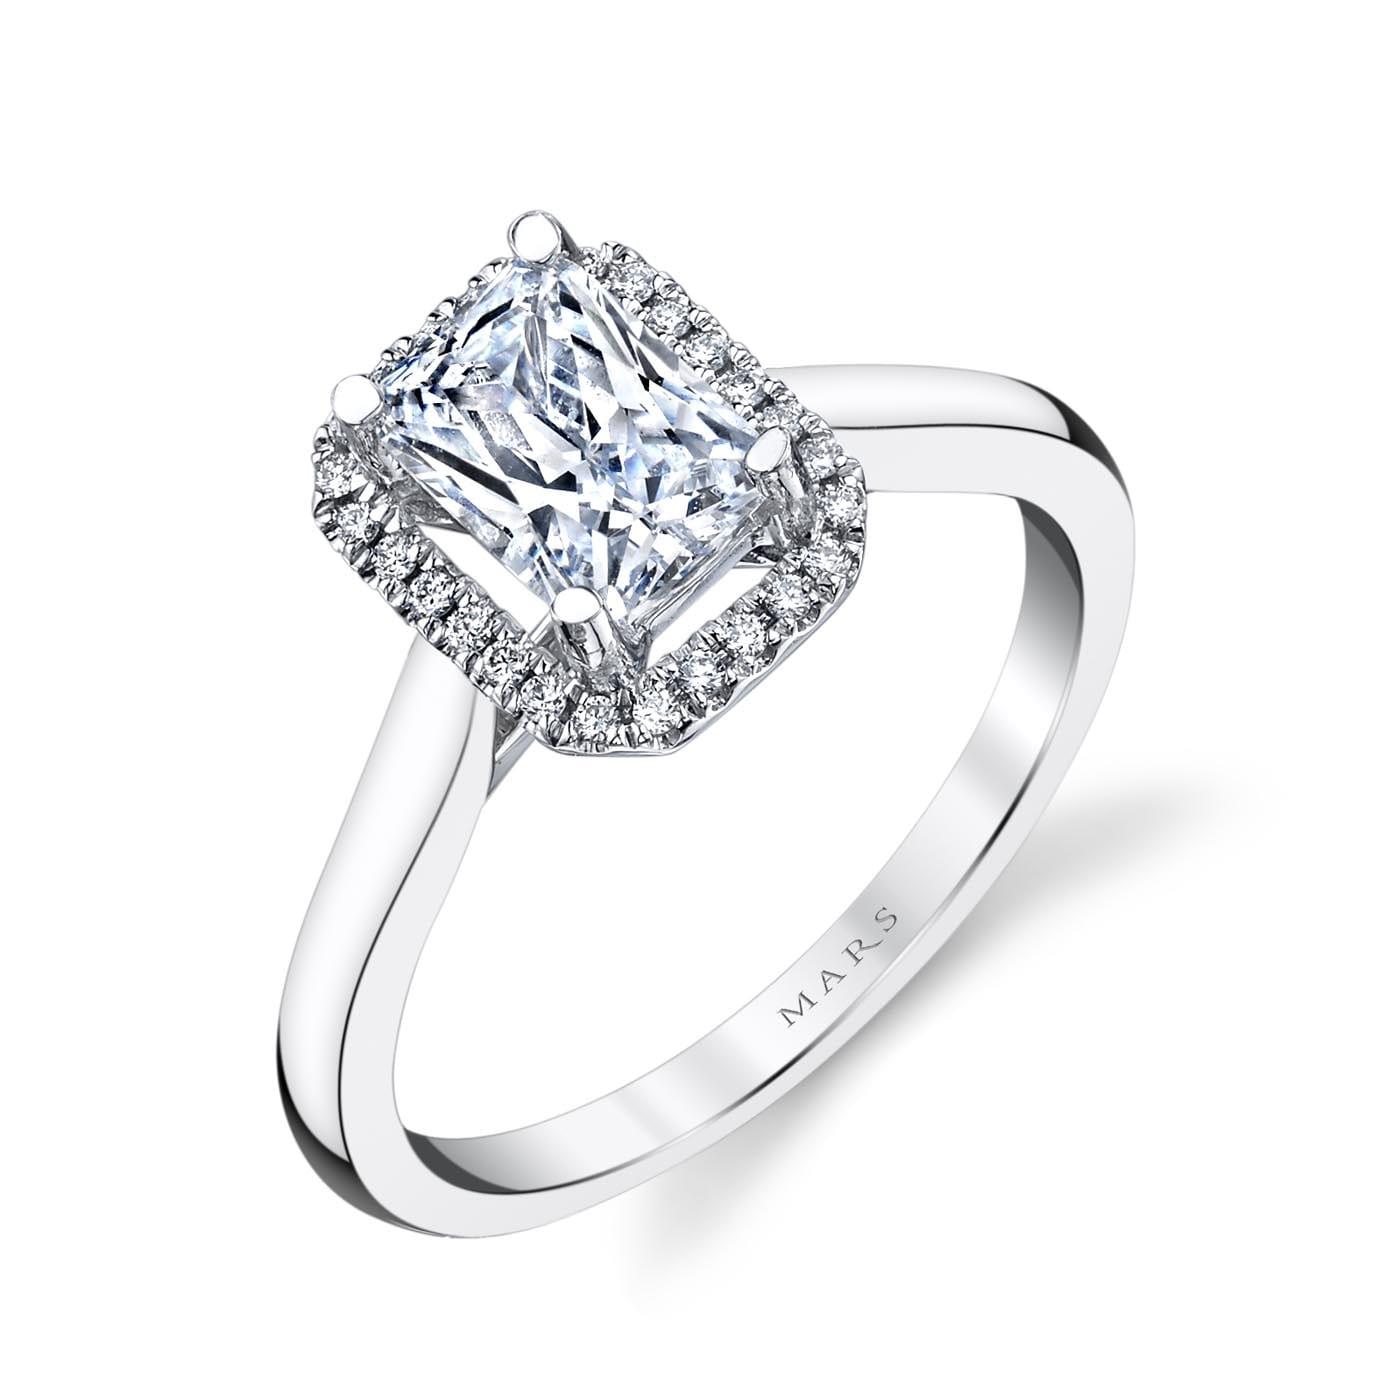 Halo Engagement RingStyle #: MARS 26498